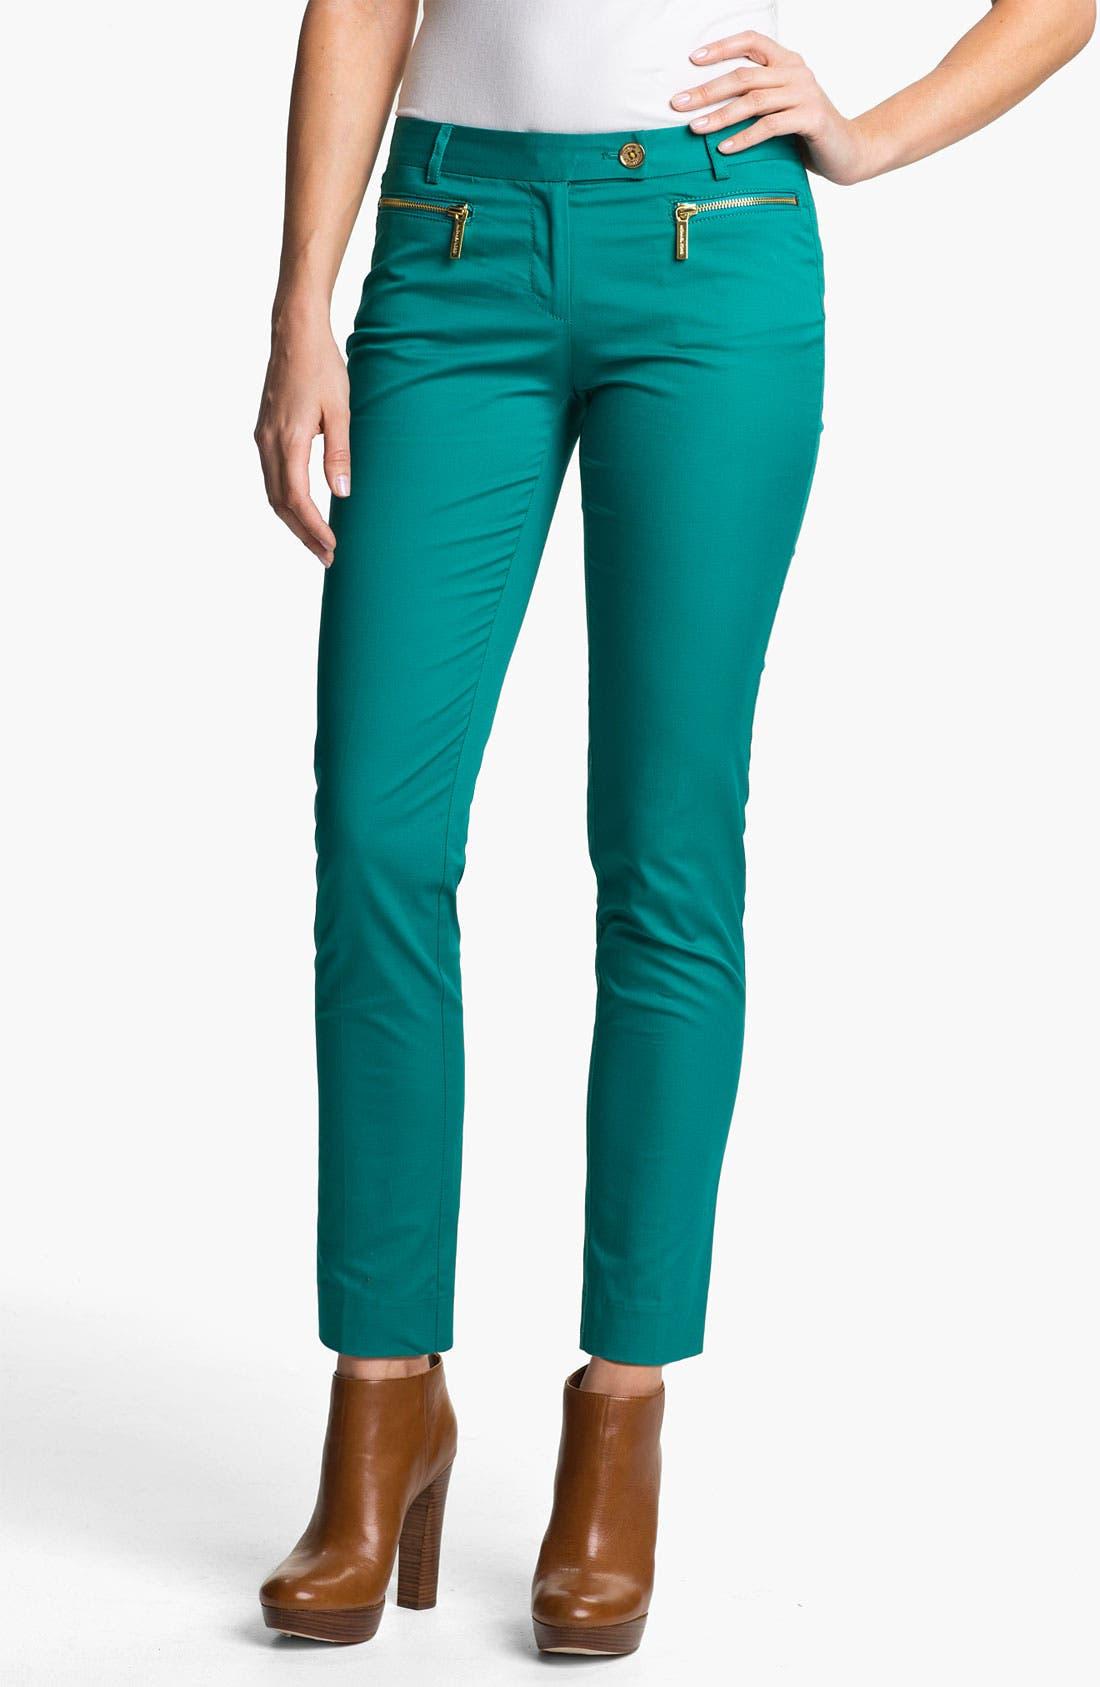 Alternate Image 1 Selected - MICHAEL Michael Kors Zip Pocket Ankle Pants (Petite)